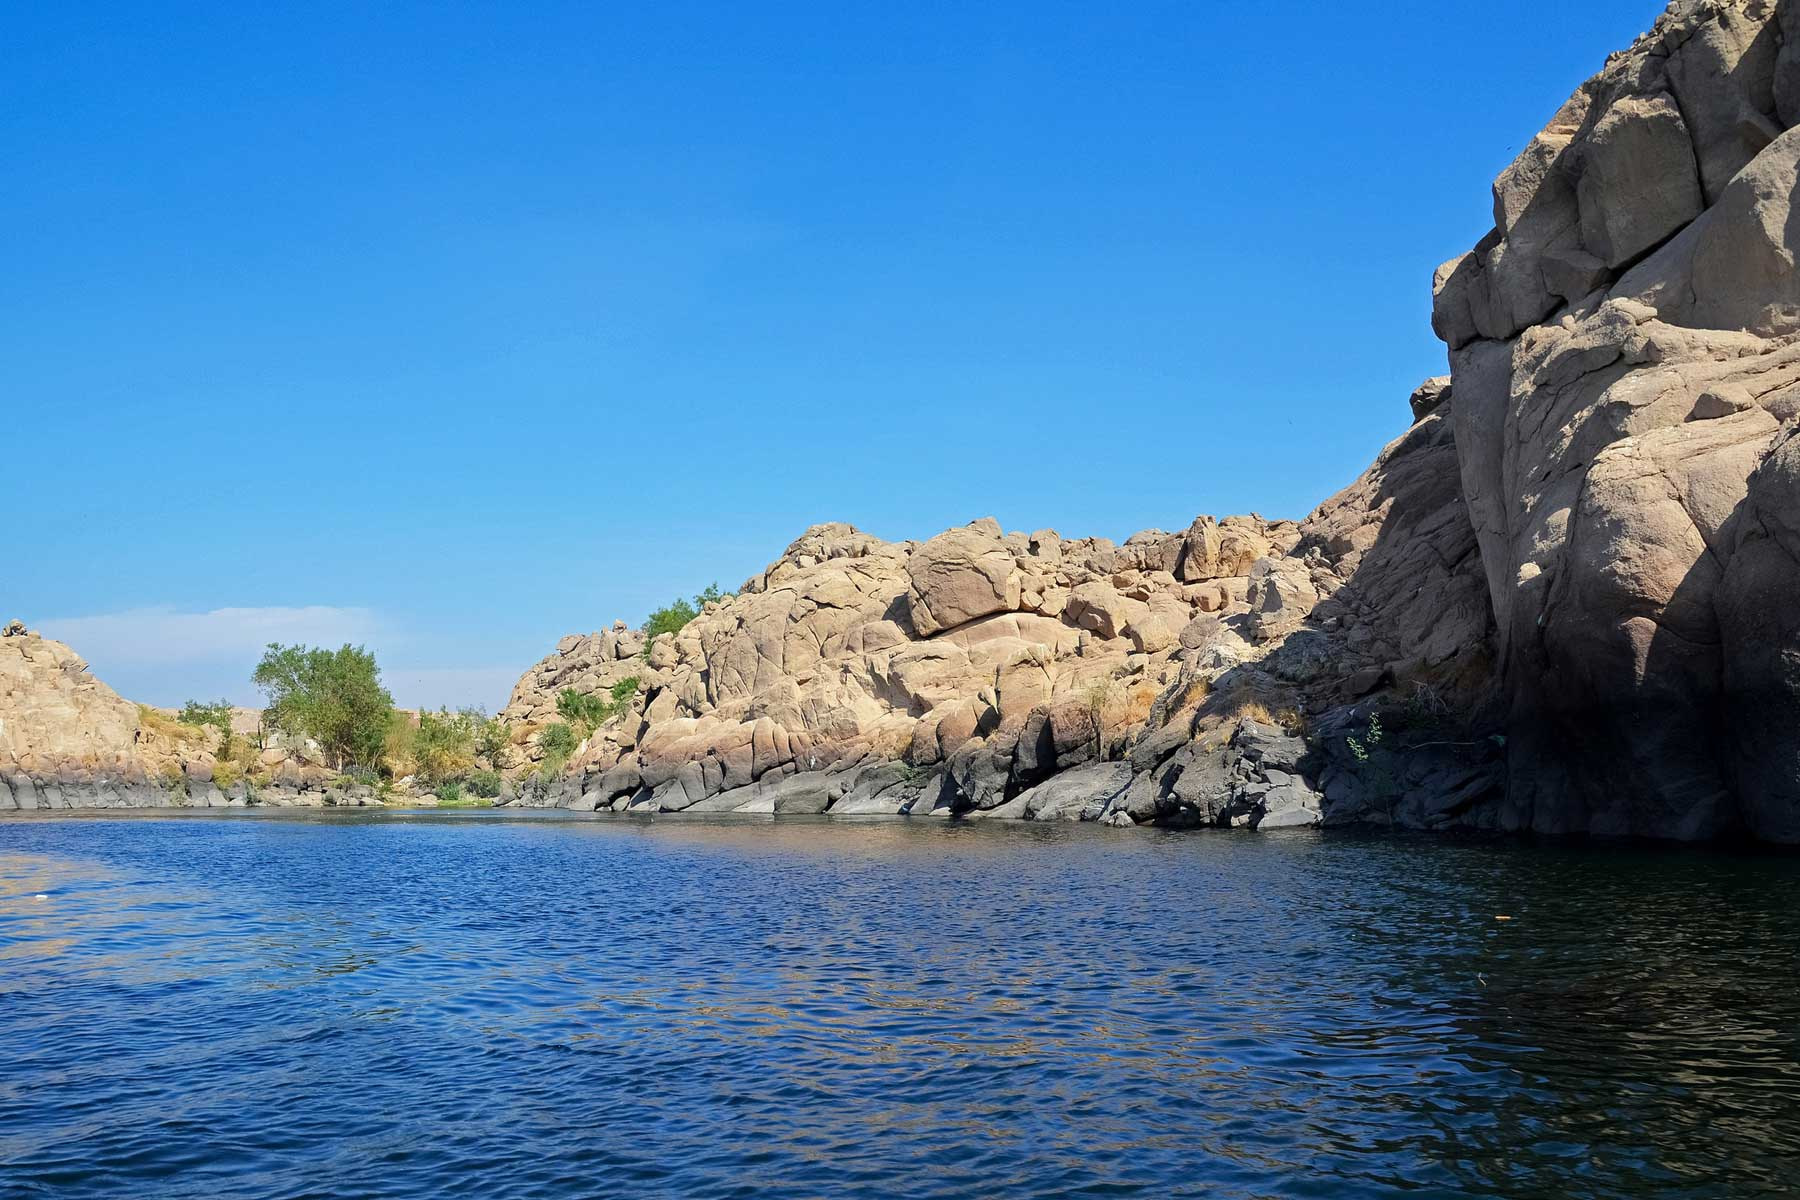 Nile cruise honeymoon